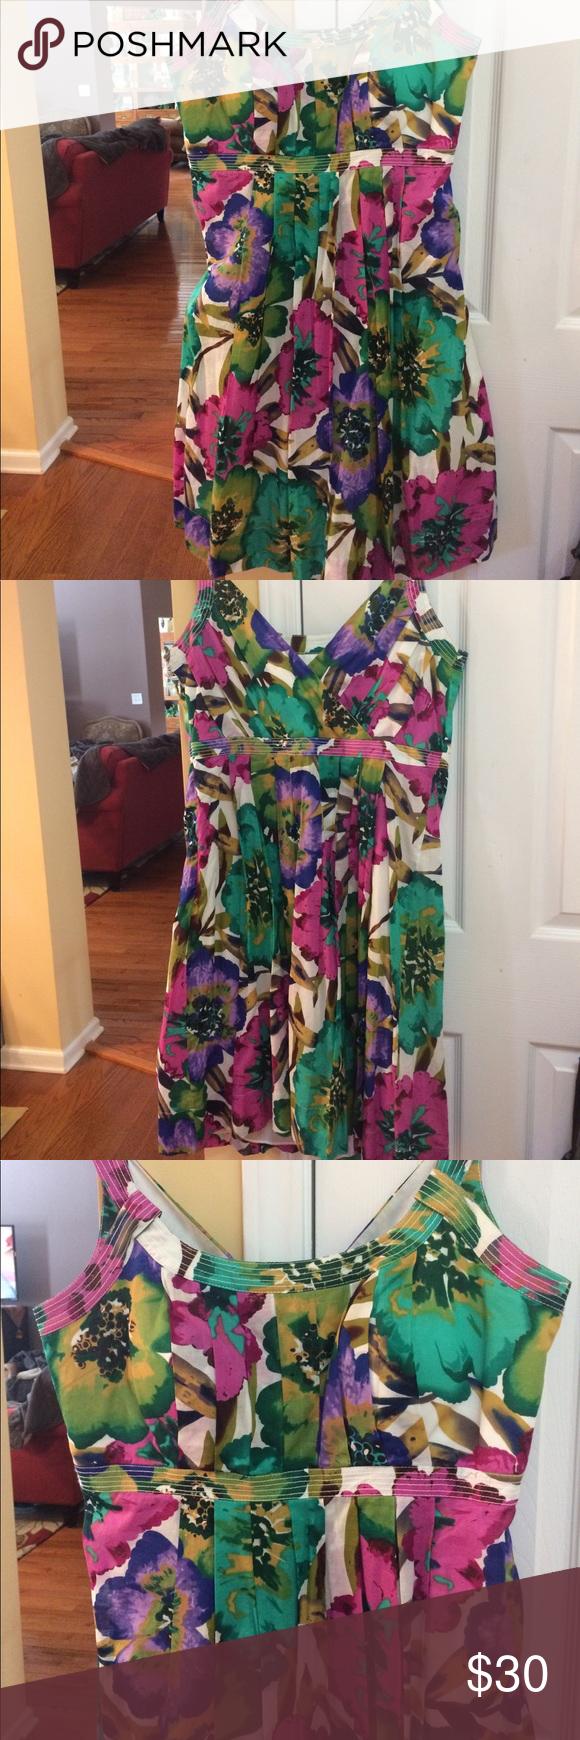 Calvin Klein summer dress. NWT 14W GORGeous Calvin Klein colorful summer dress. Cool & comfortable! 14W Calvin Klein Dresses